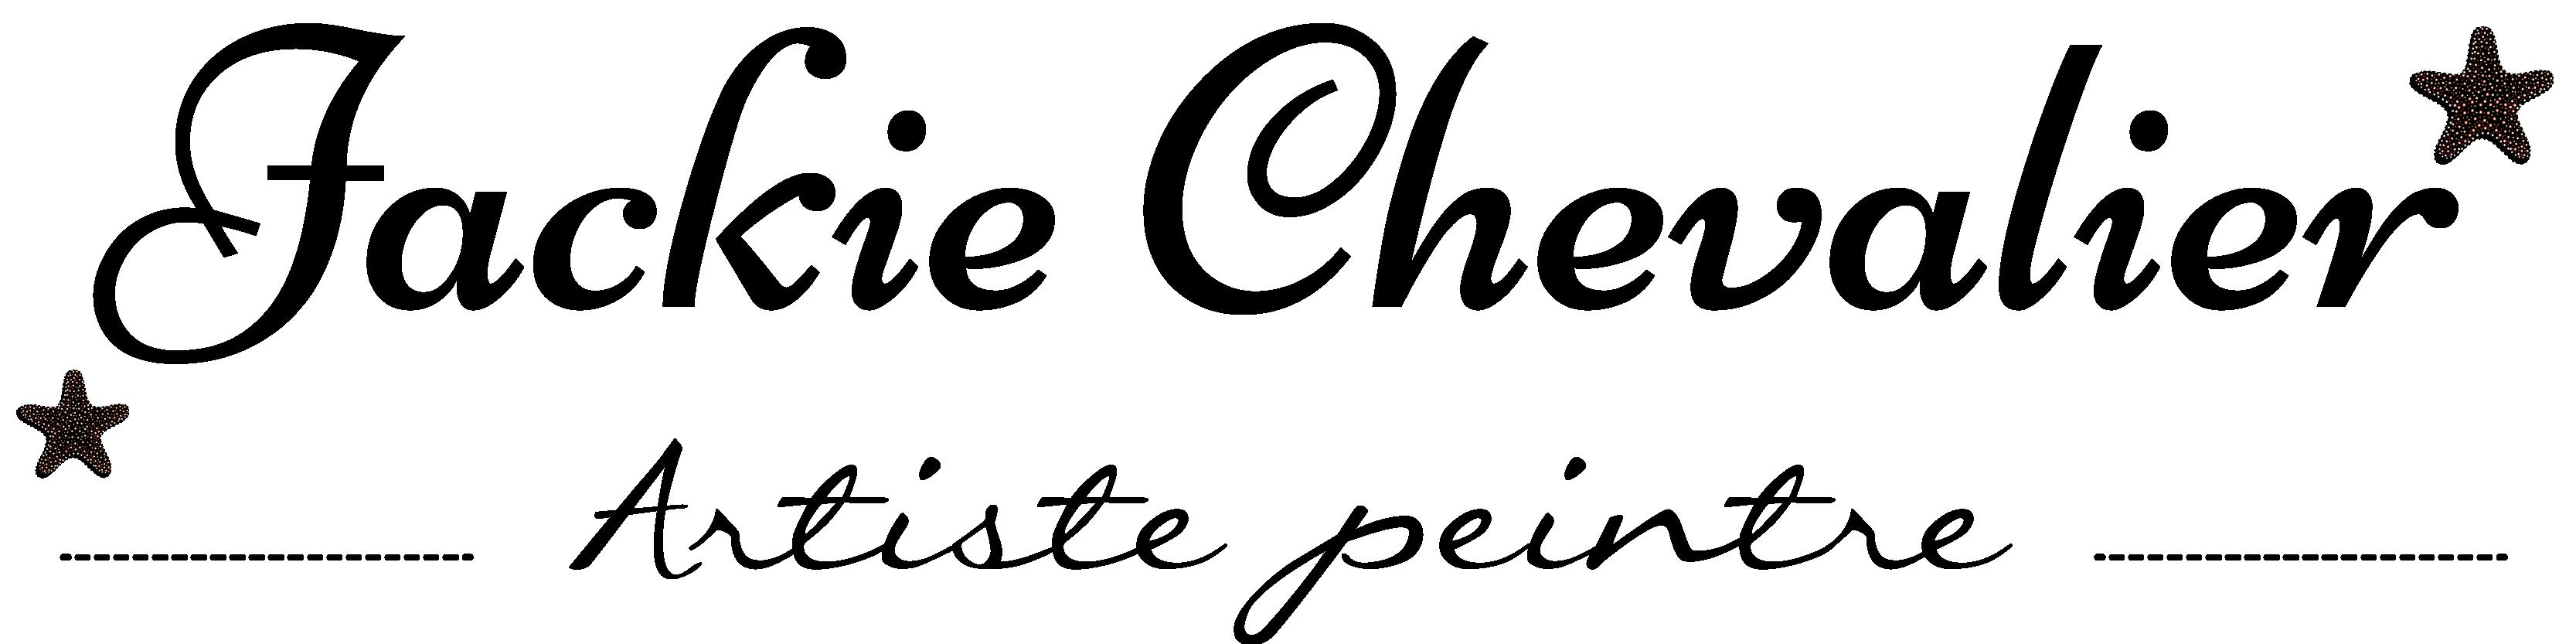 JCH-Galerie